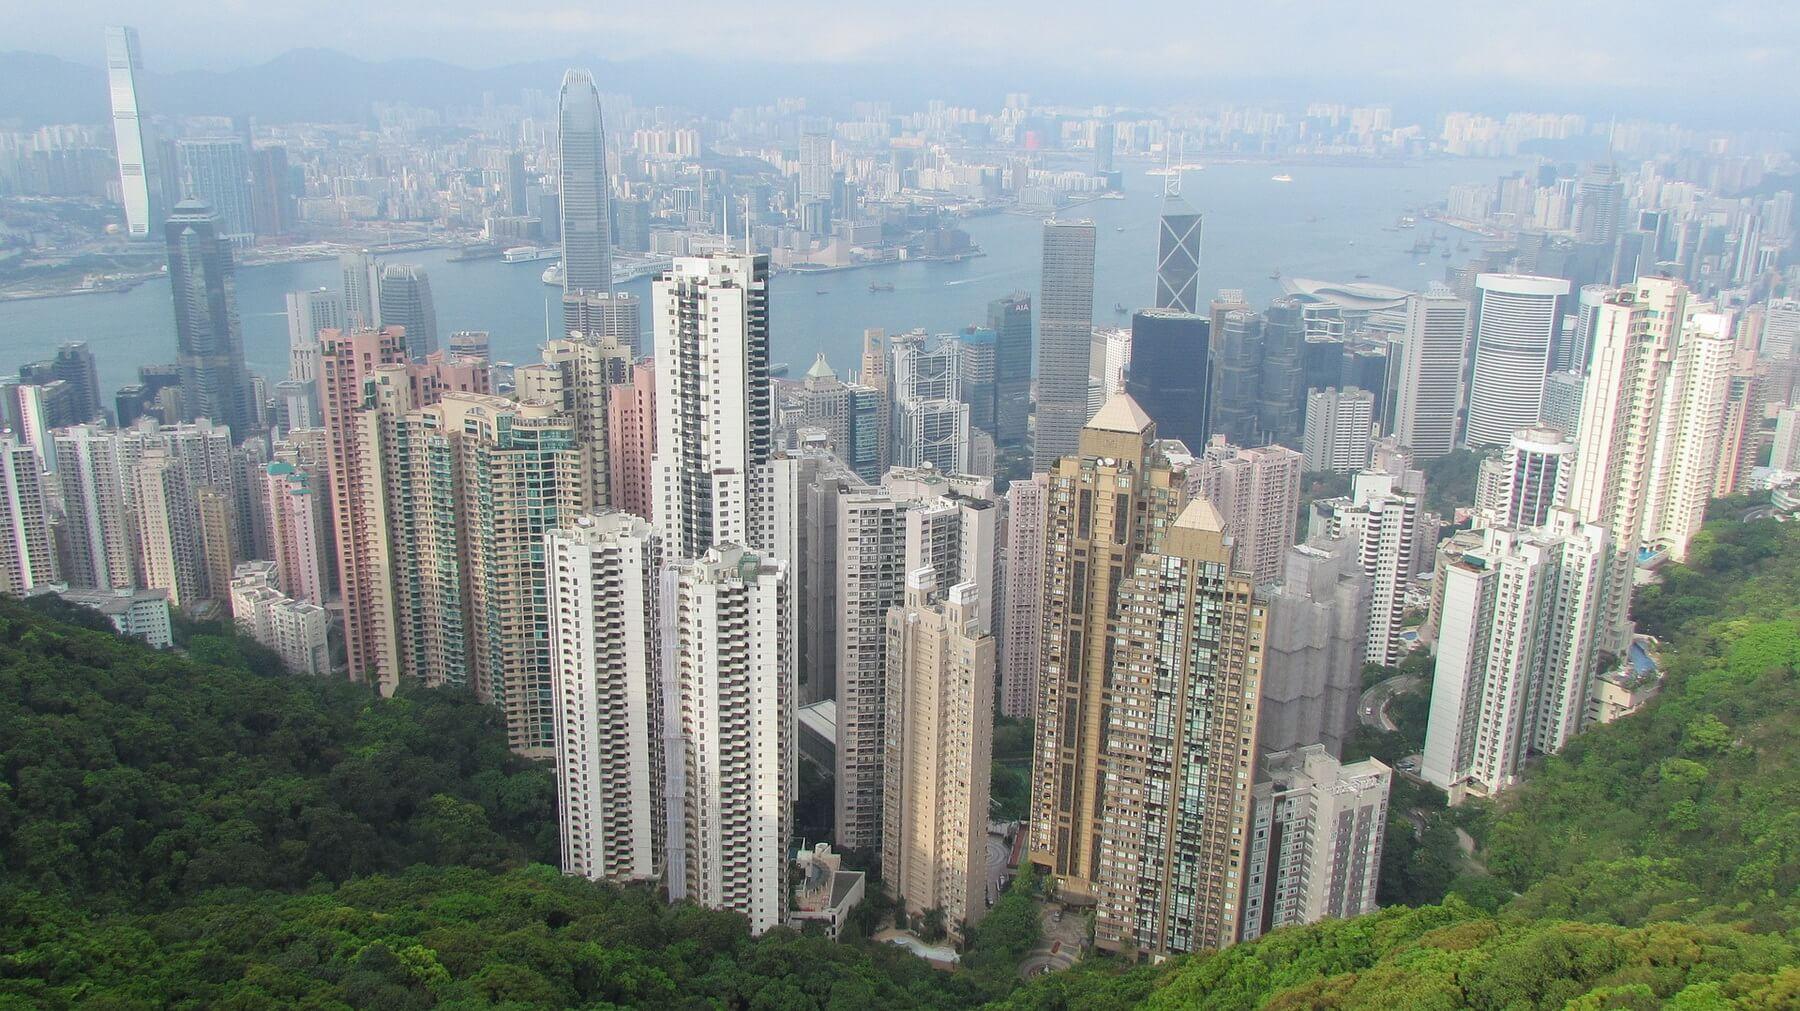 Die Skyline von Hongkong streng nach Feng Shui ausgerichtet